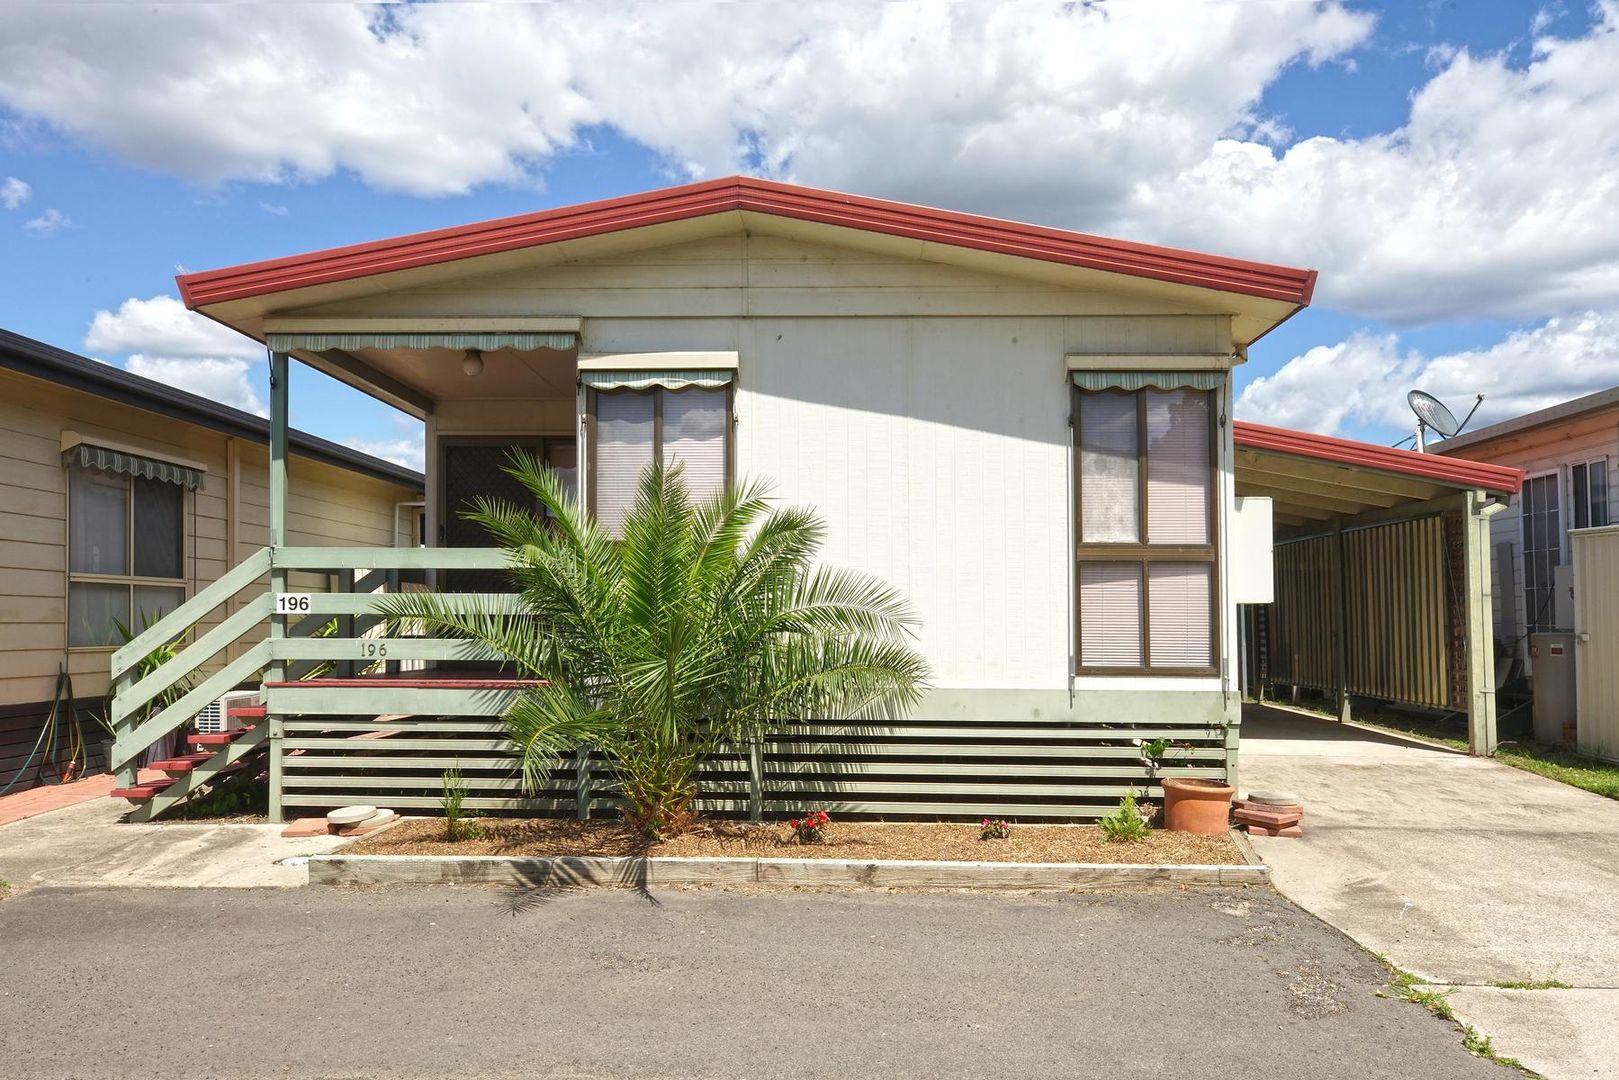 196/6-22 Tench Avenue, Jamisontown NSW 2750, Image 0